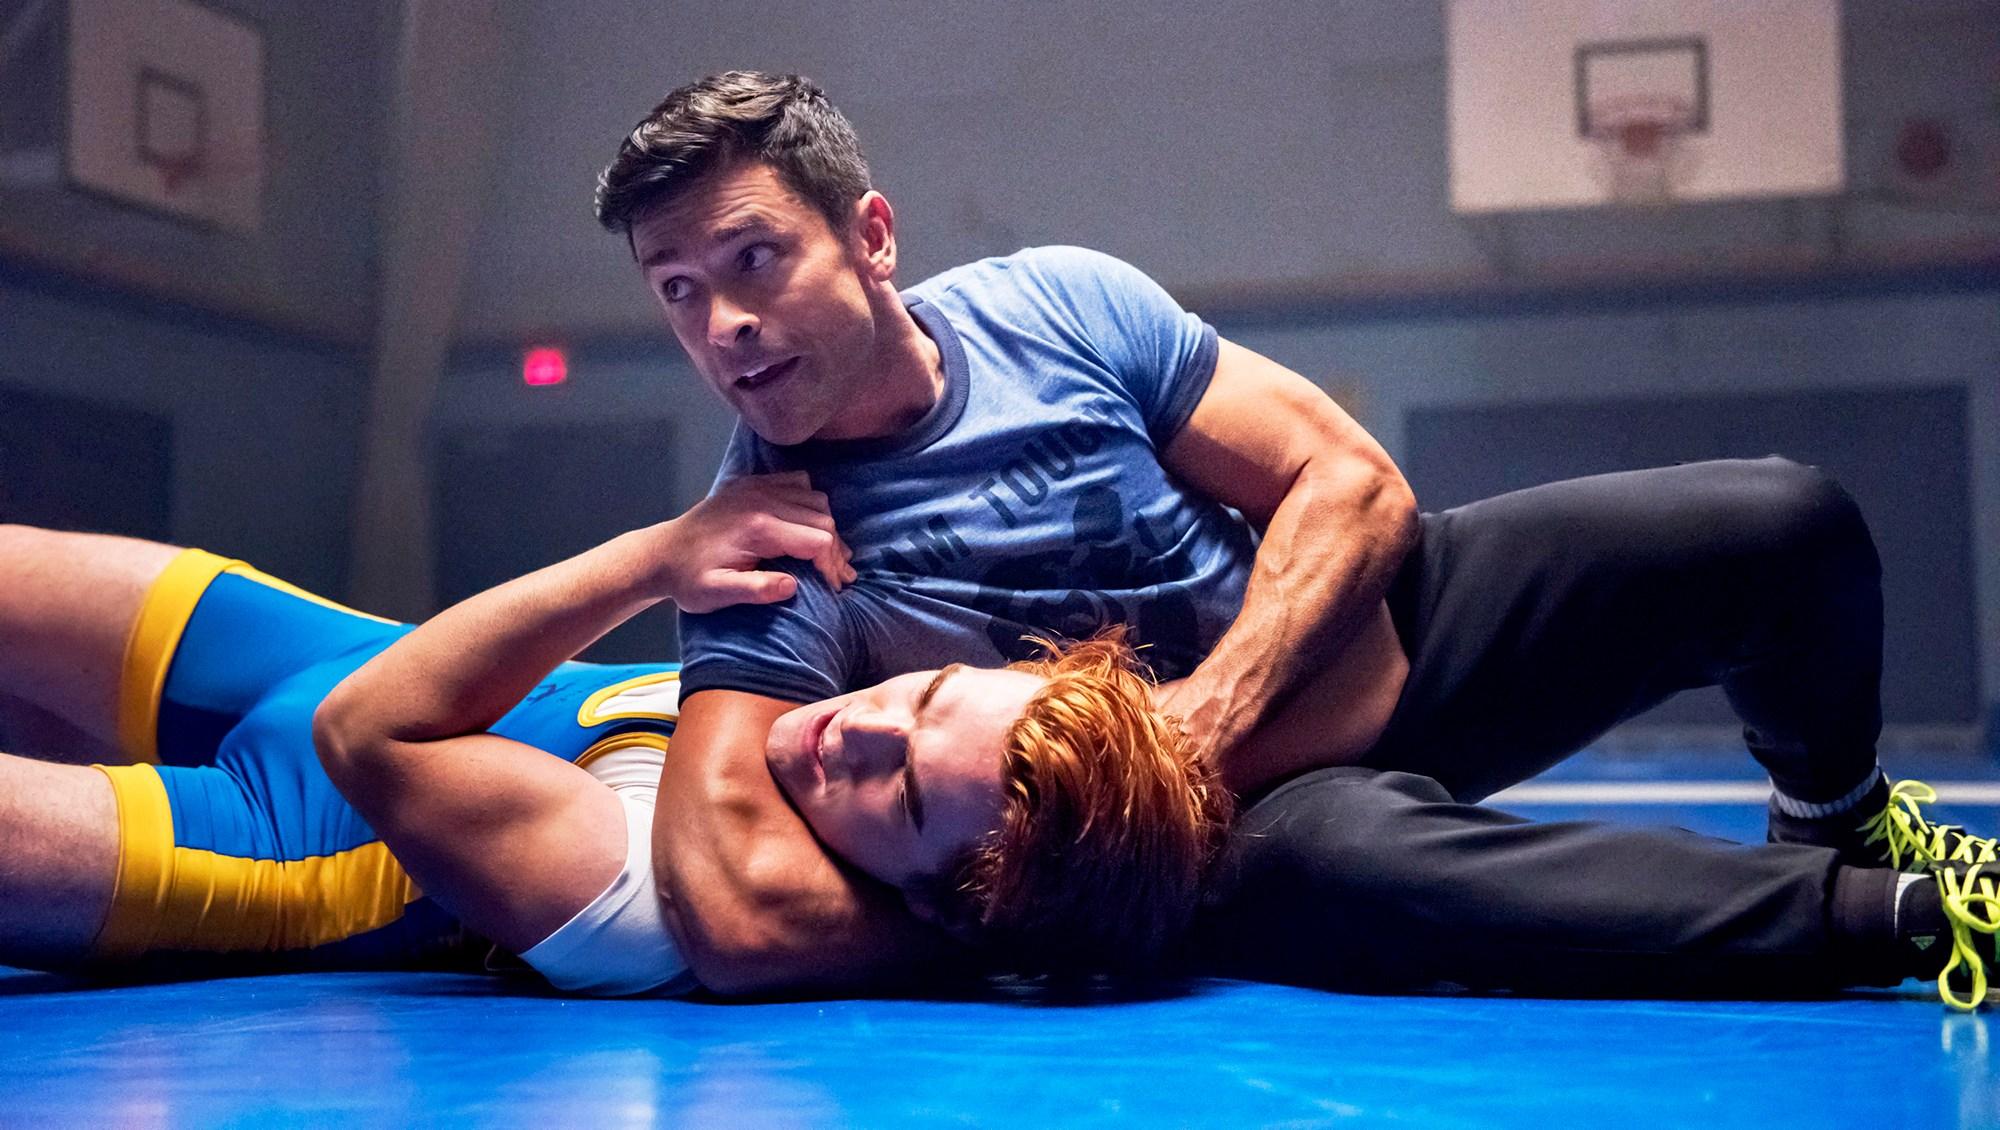 KJ Apa as Archie and Mark Consuelos as Hiram in 'Riverdale'